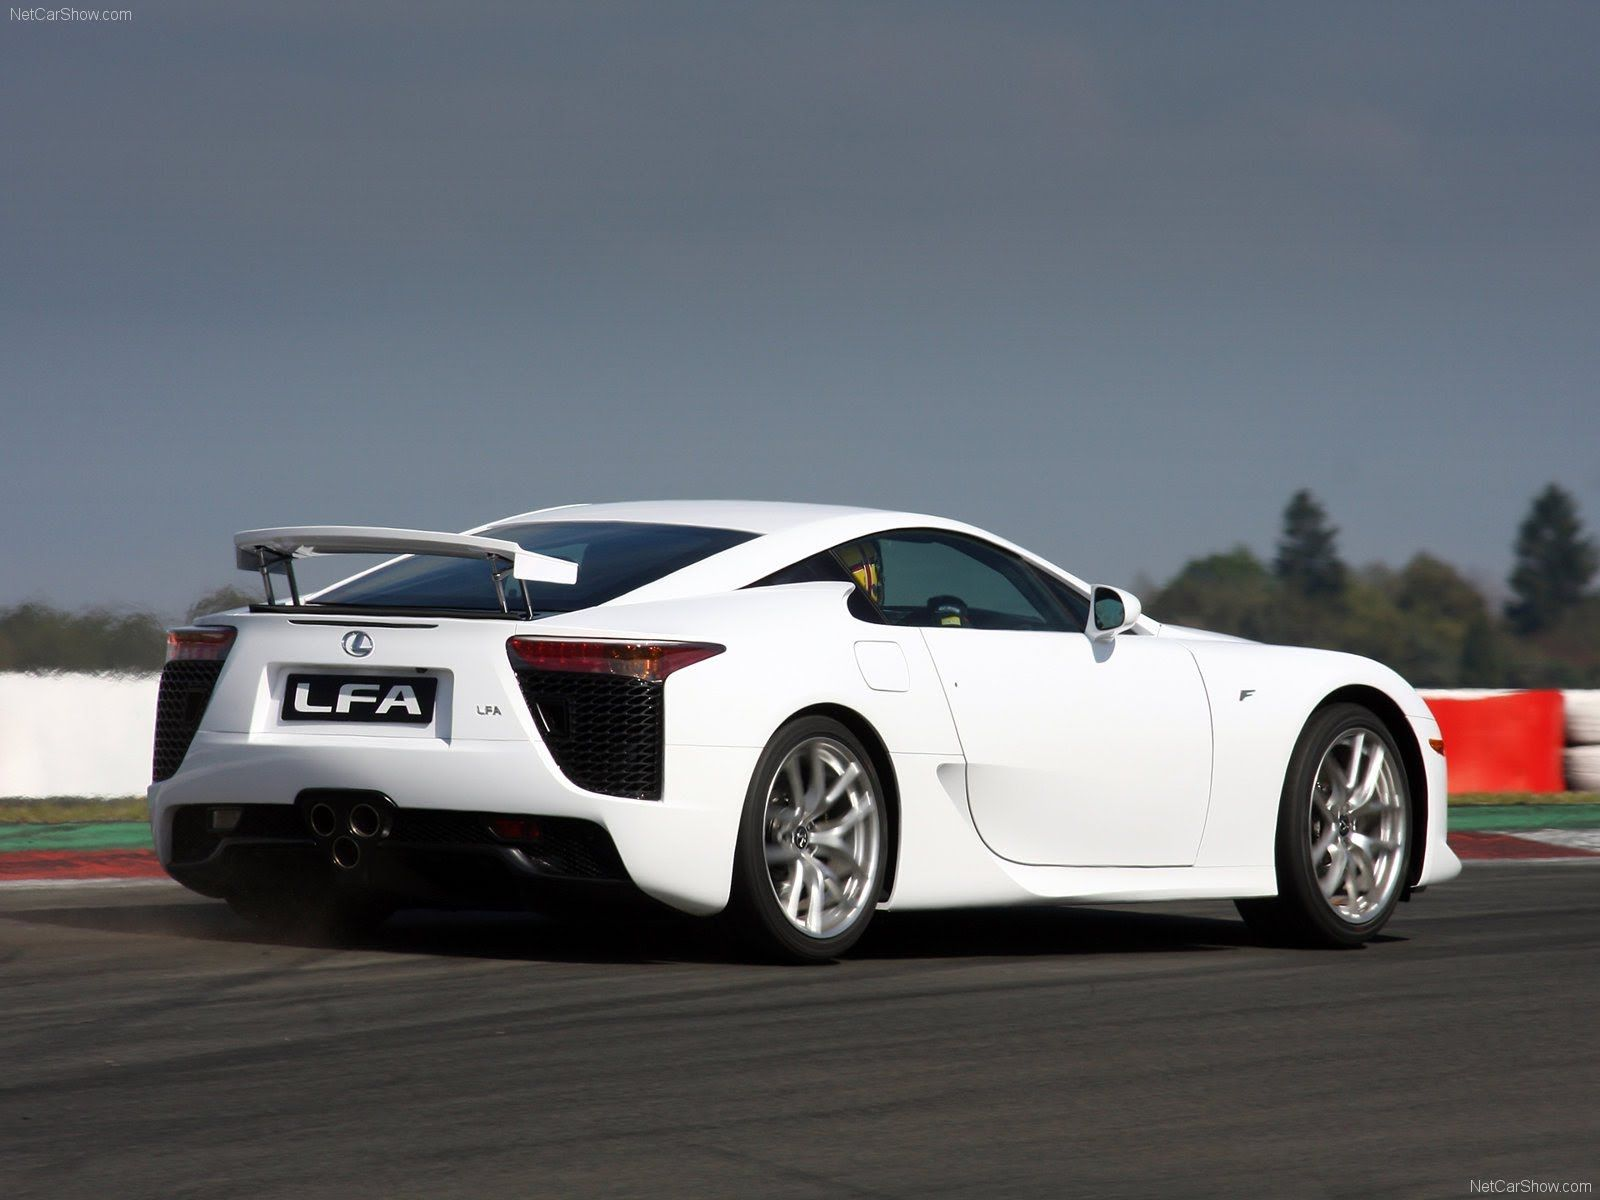 National Geographic Megafactories Lexus Lfa 1080p Lexus Lfa Lexus Cars New Lexus